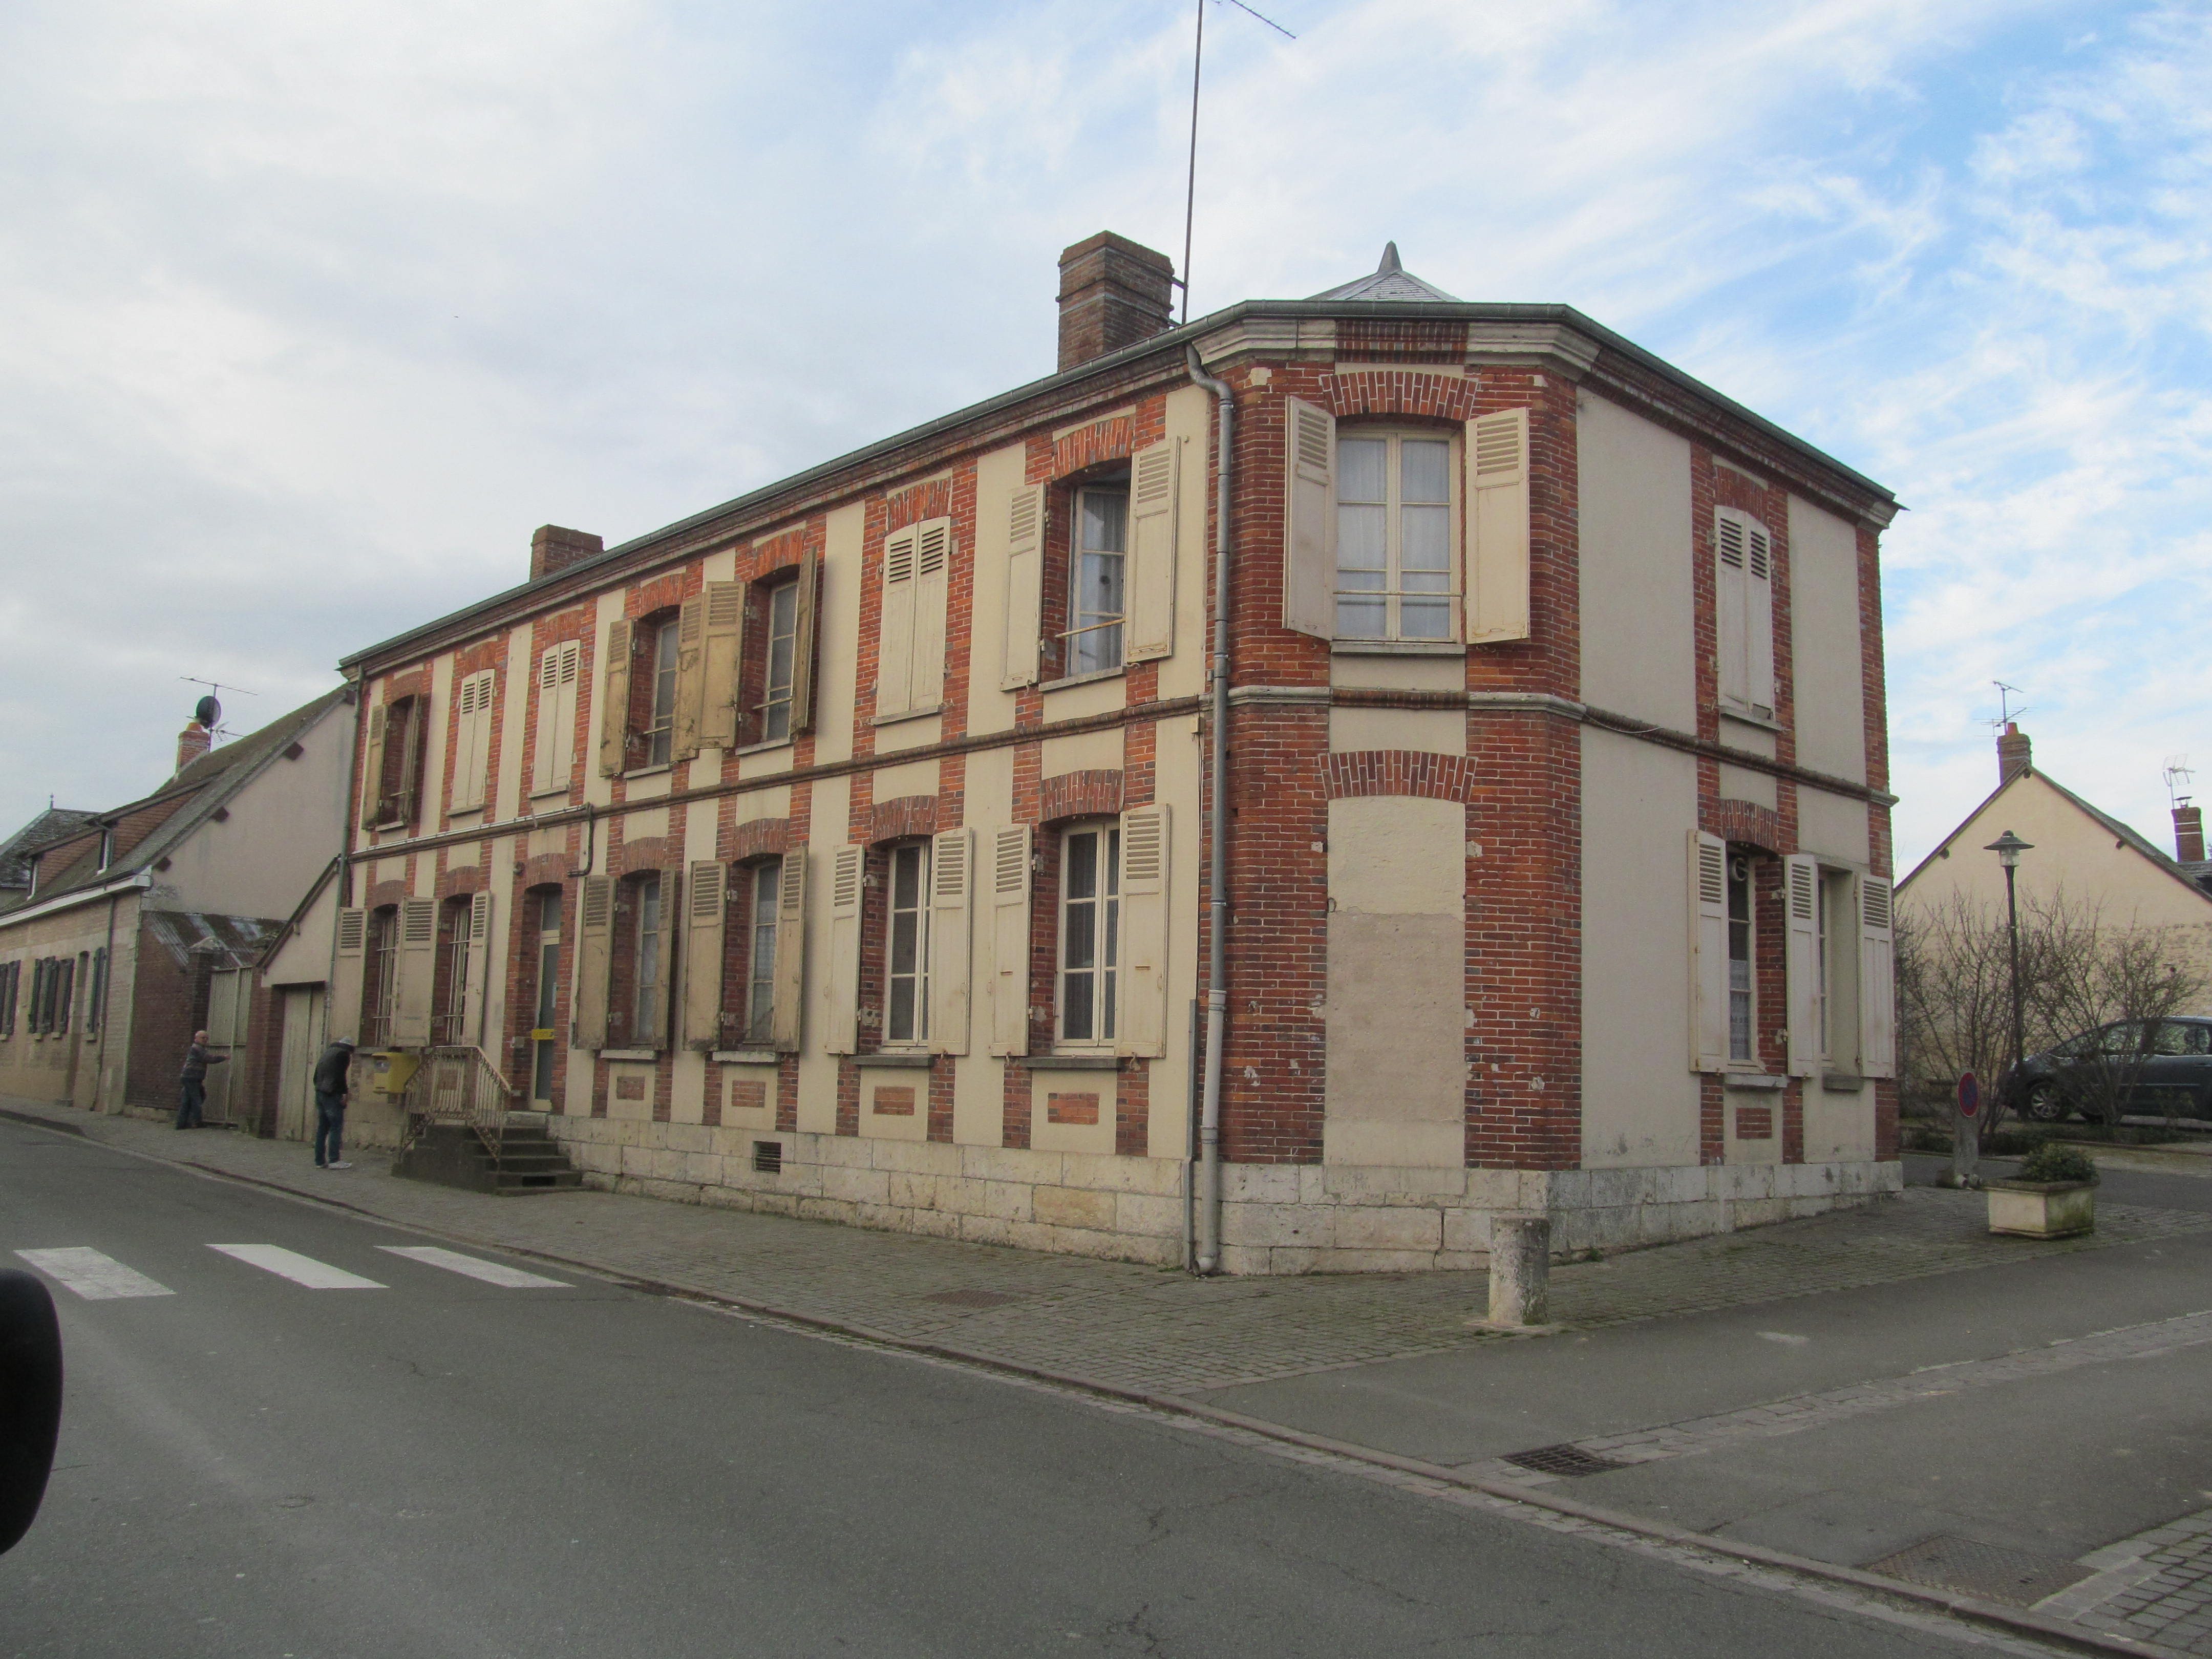 dammarie logement